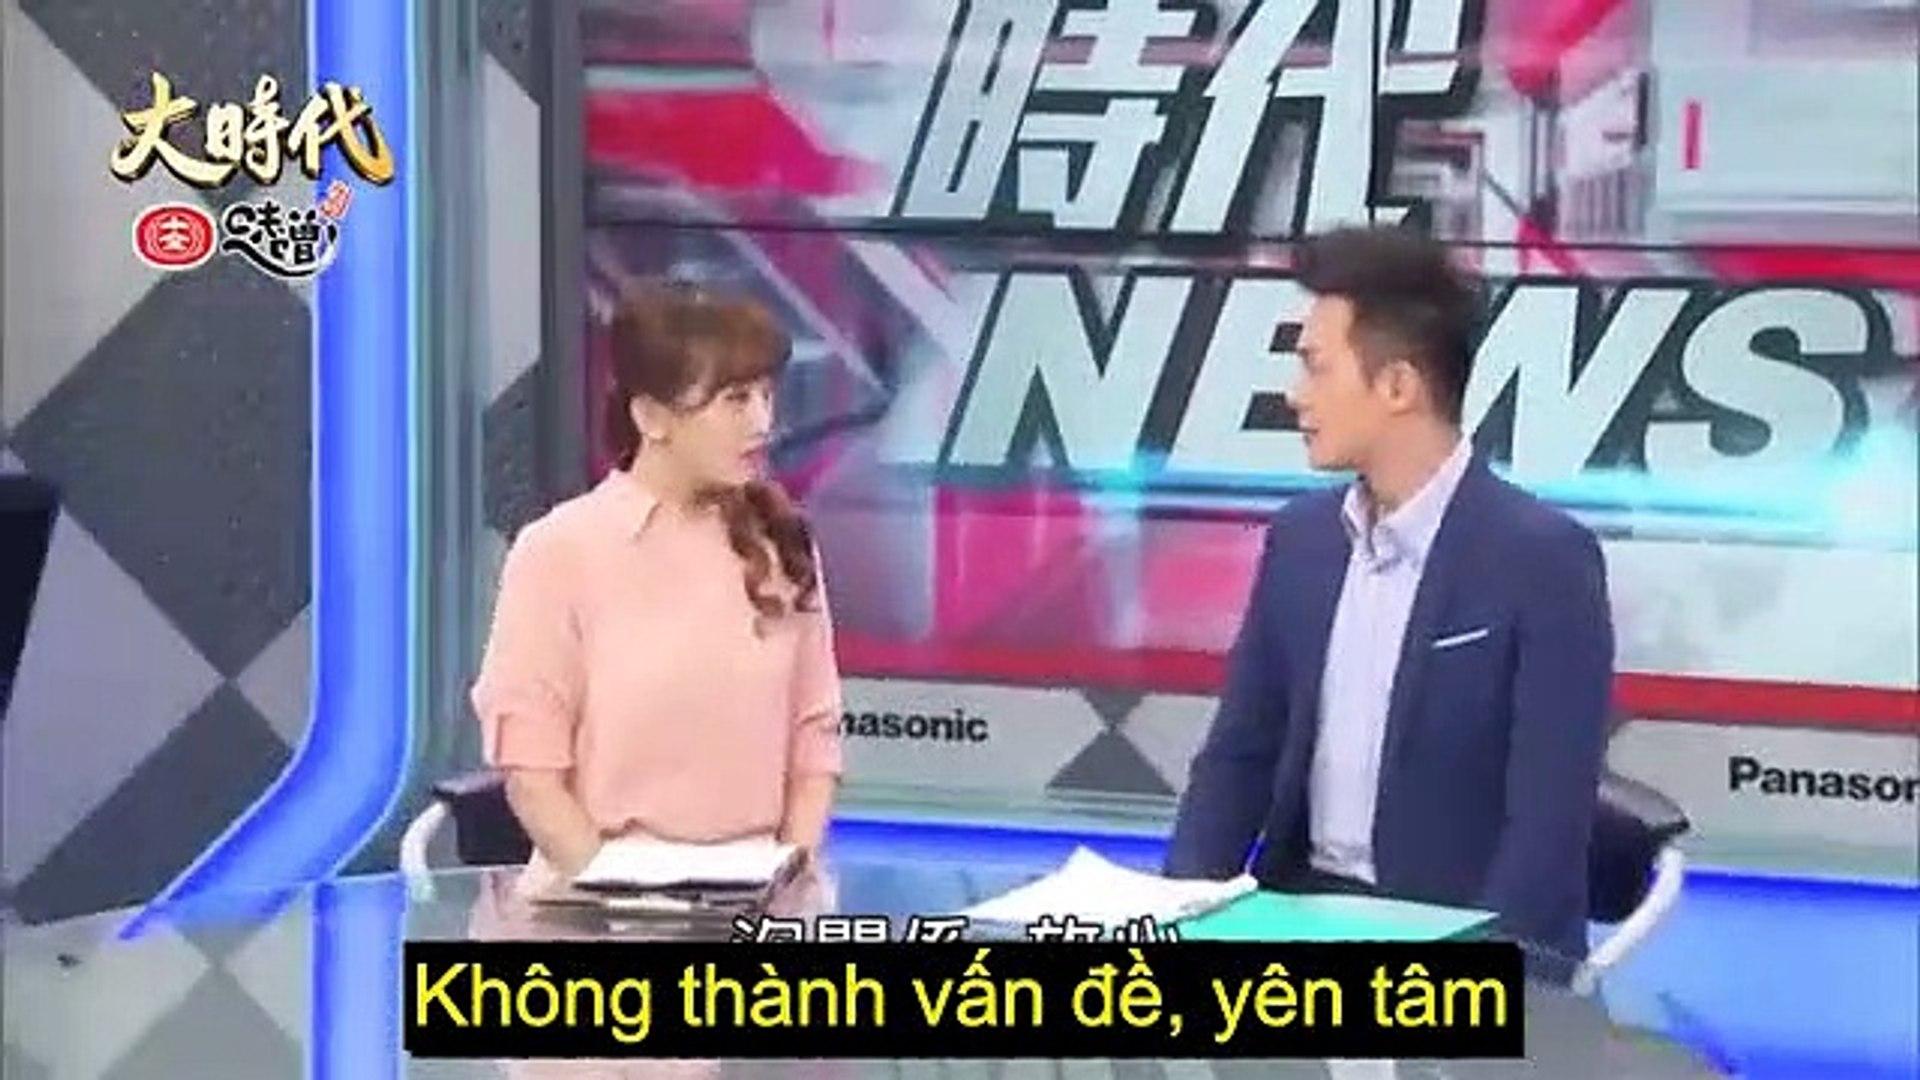 Đại Thời Đại Tập 230 - Phim Đài Loan - THVL1 Lồng Tiếng - Phim Dai Thoi Dai Tap 231 - Phim Dai Thoi